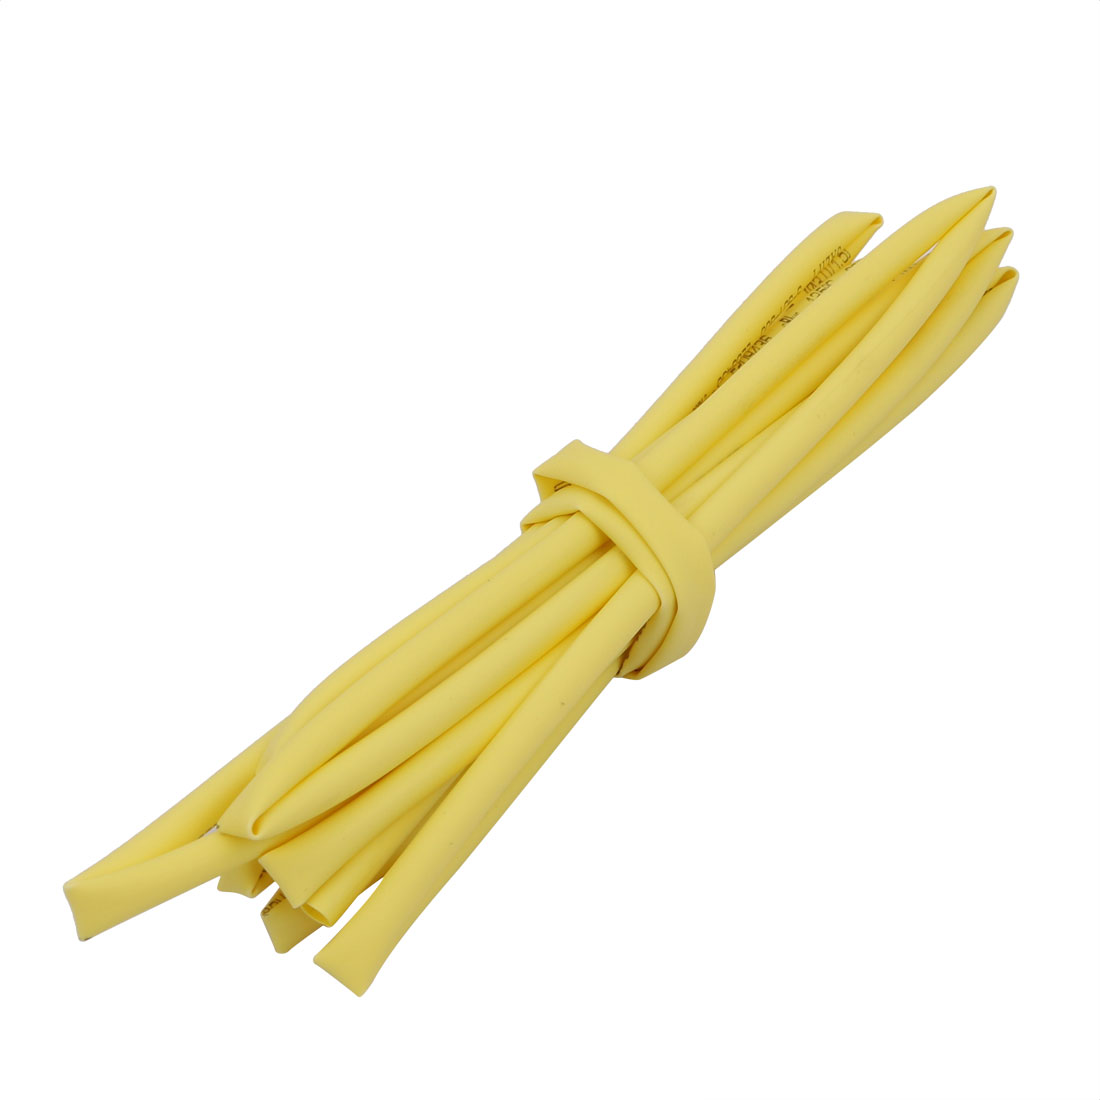 2M 0.12in Inner Dia Polyolefin Flame Retardant Tube Yellow for Wire Repairing